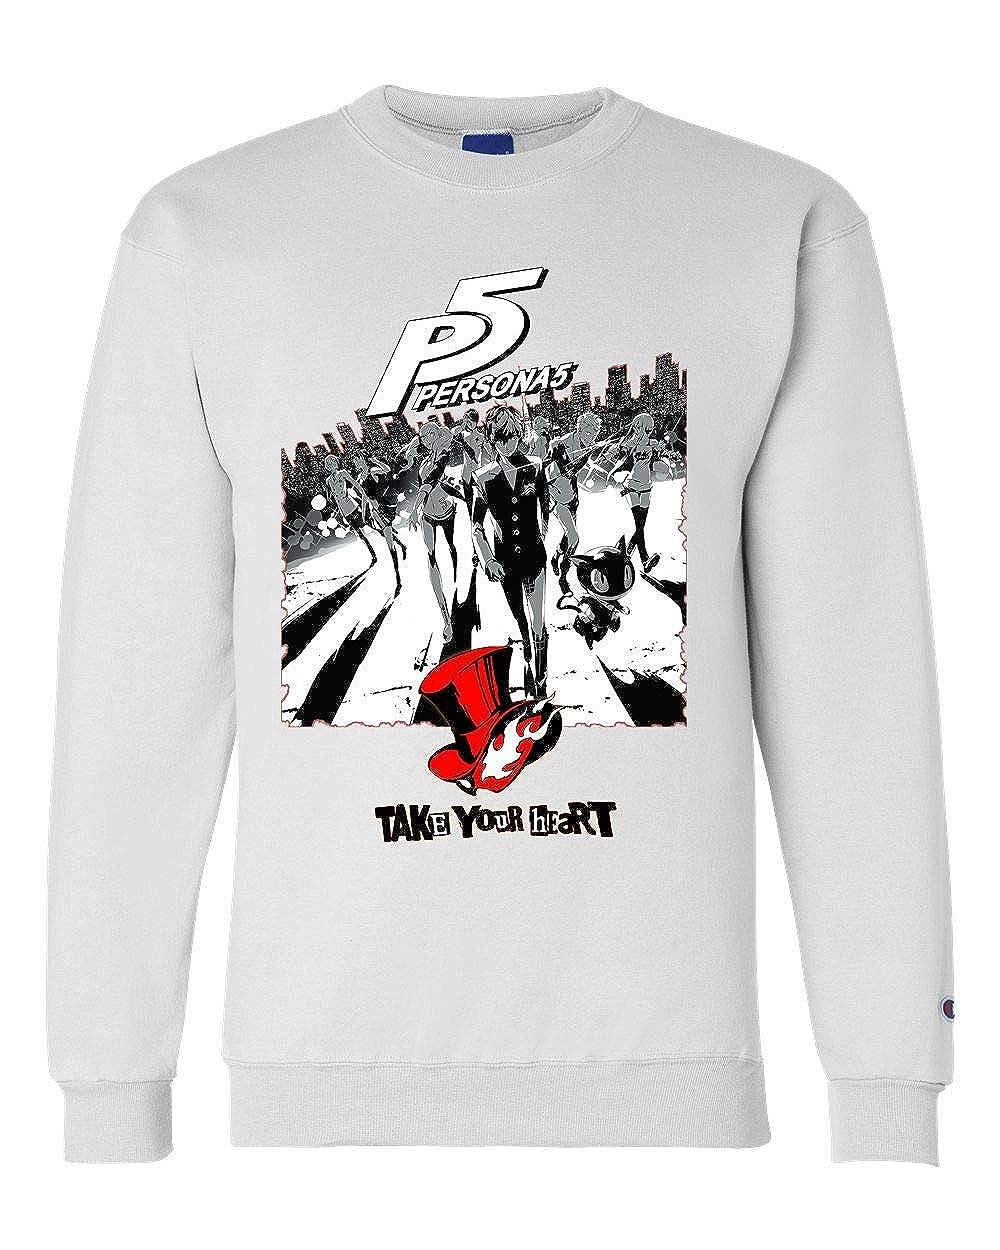 Persona 5 Game Unisex Champion Crewneck Sweatshirt